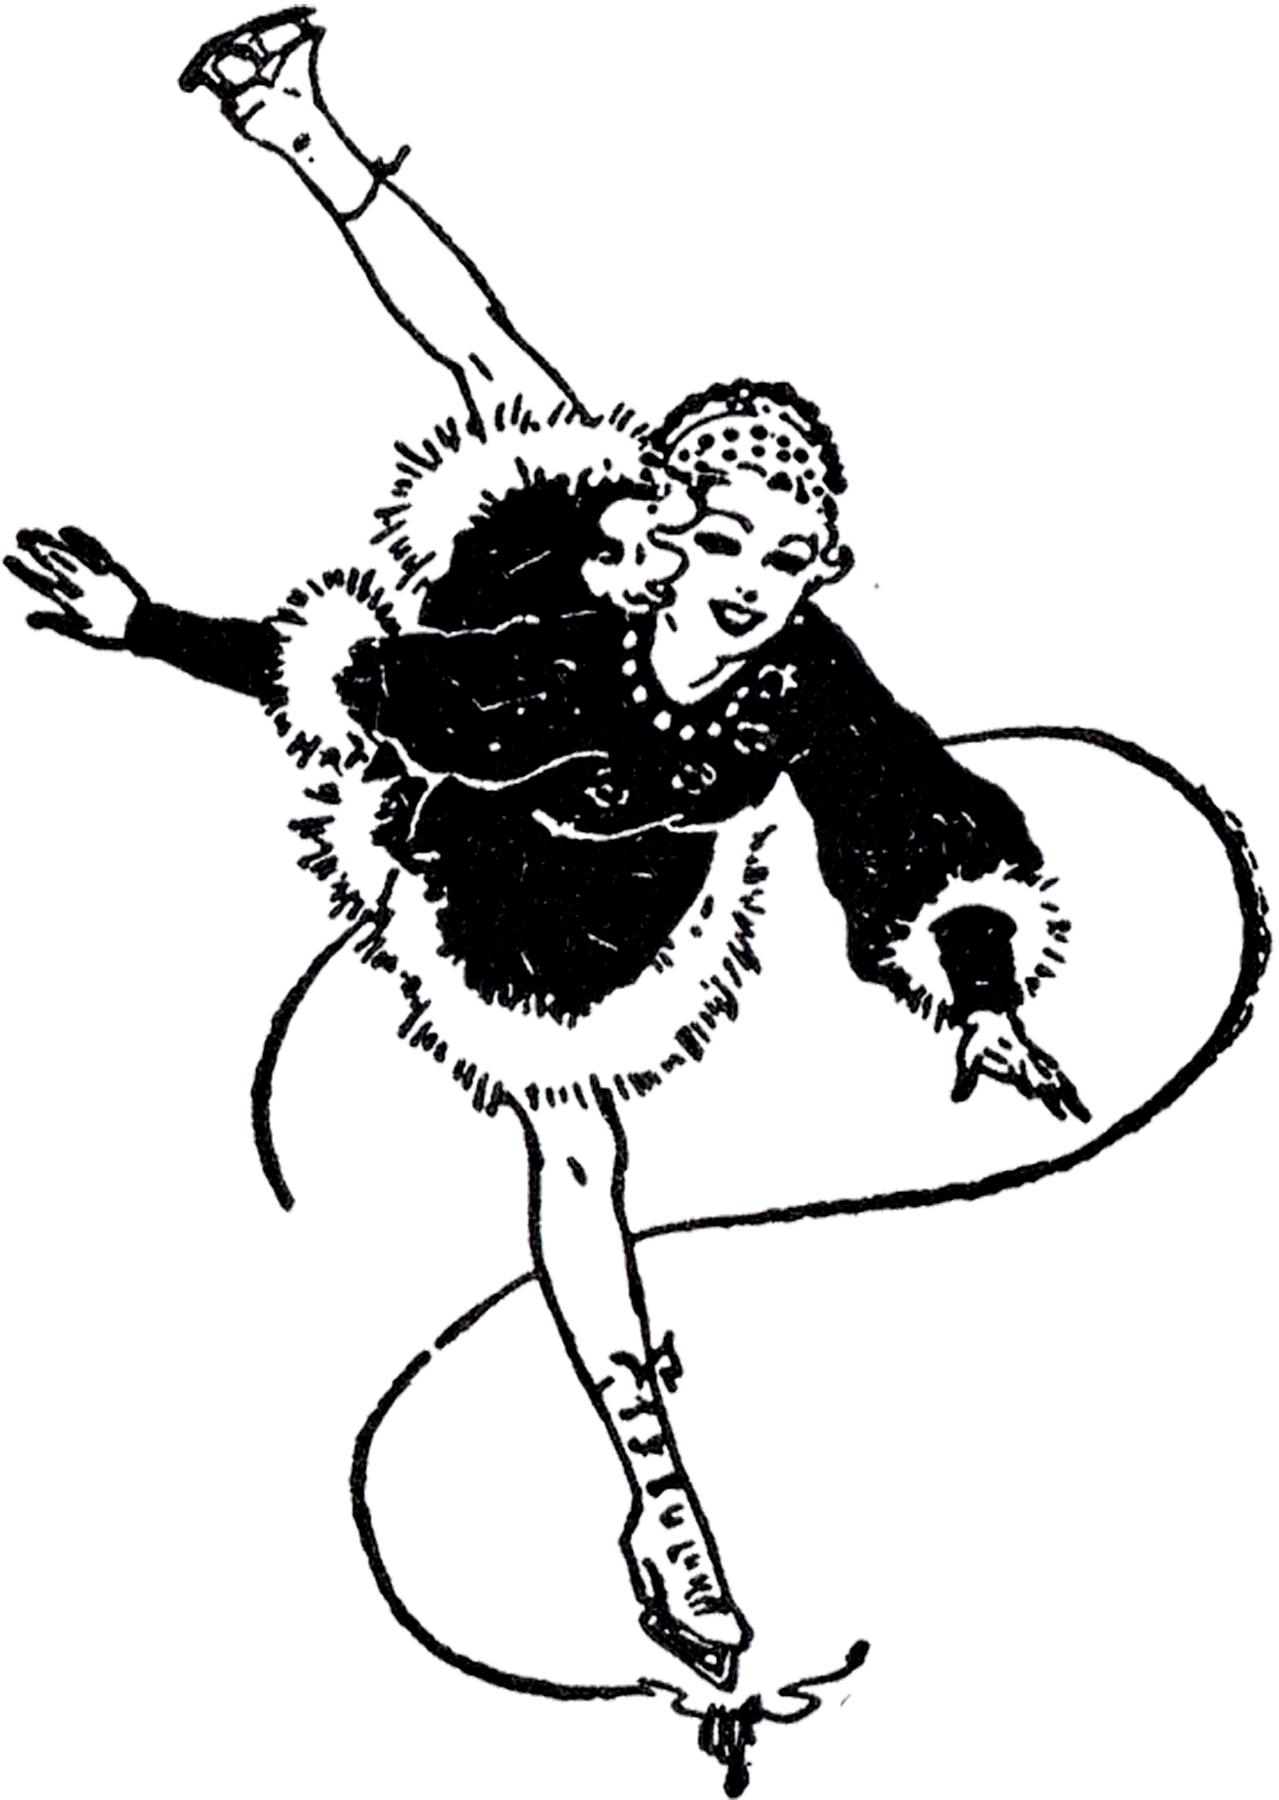 Vintage Figure Skating Image